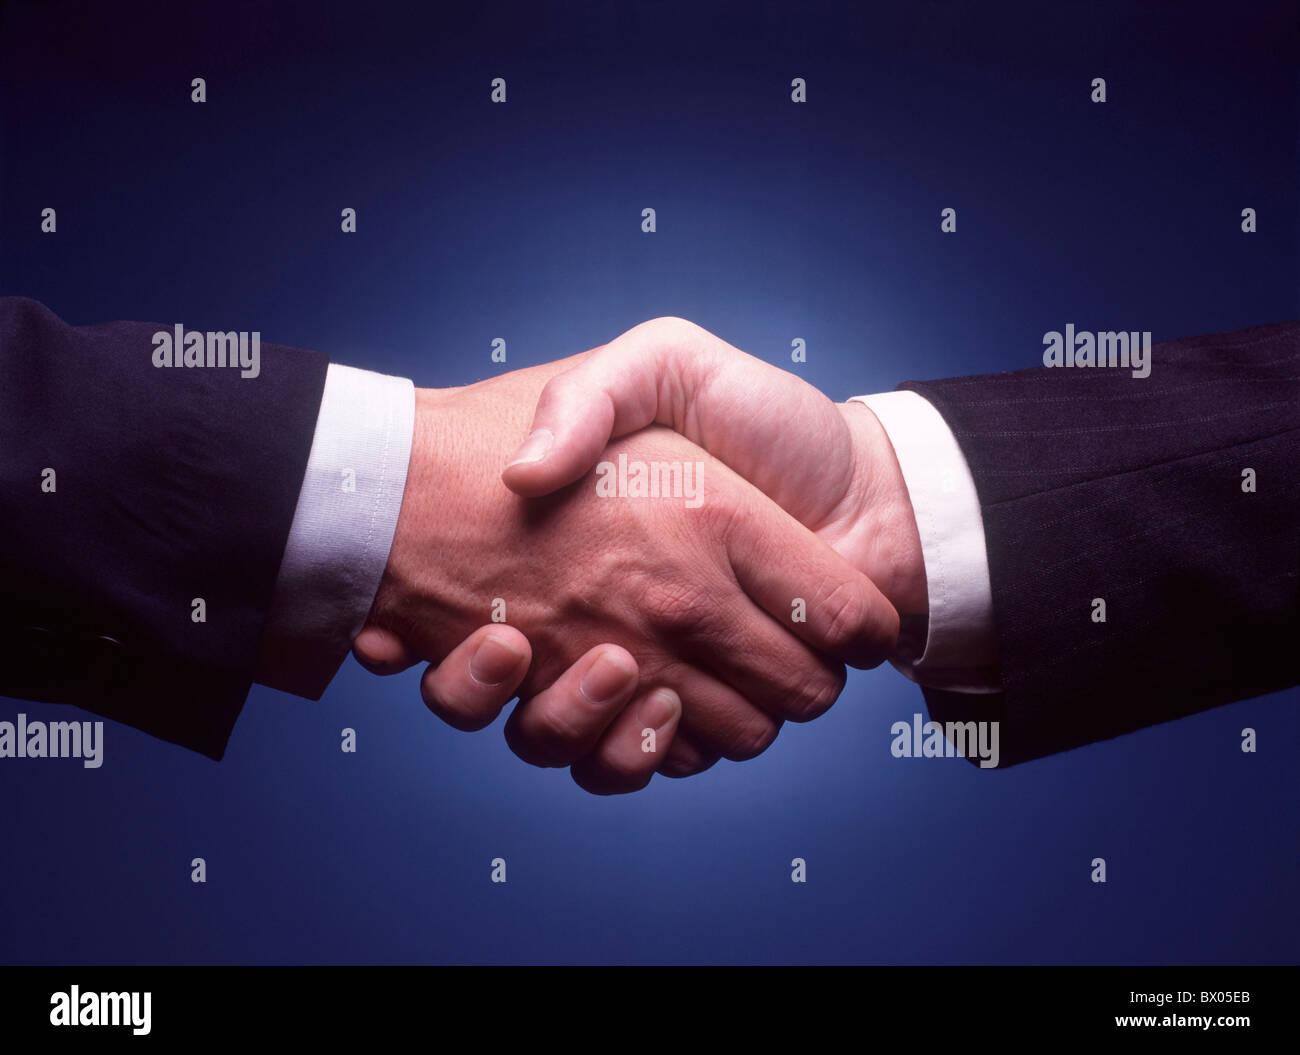 Vereinbarungen Angebote Nachkommen Geschäft Geschäft Geschäft Handel Geschäft Welt Gemeinschaft Handshake Handel Stockfoto